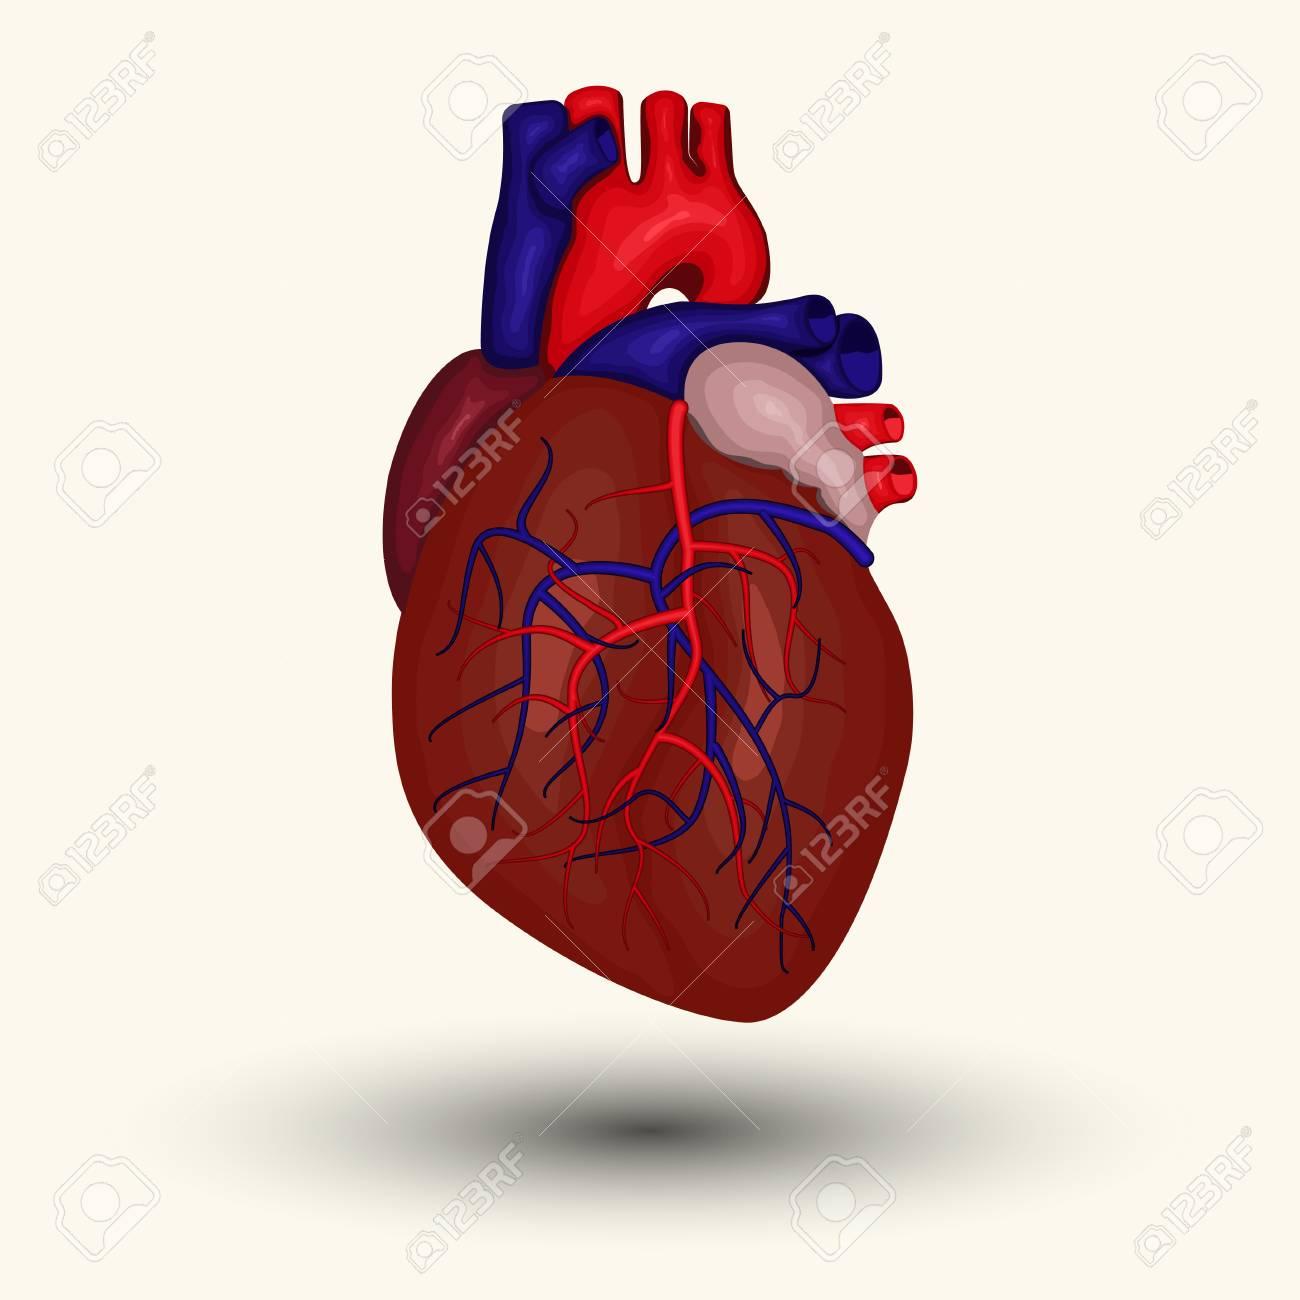 Signo Humano Corazón Icono Del Corazón Humano Dibujo Animado